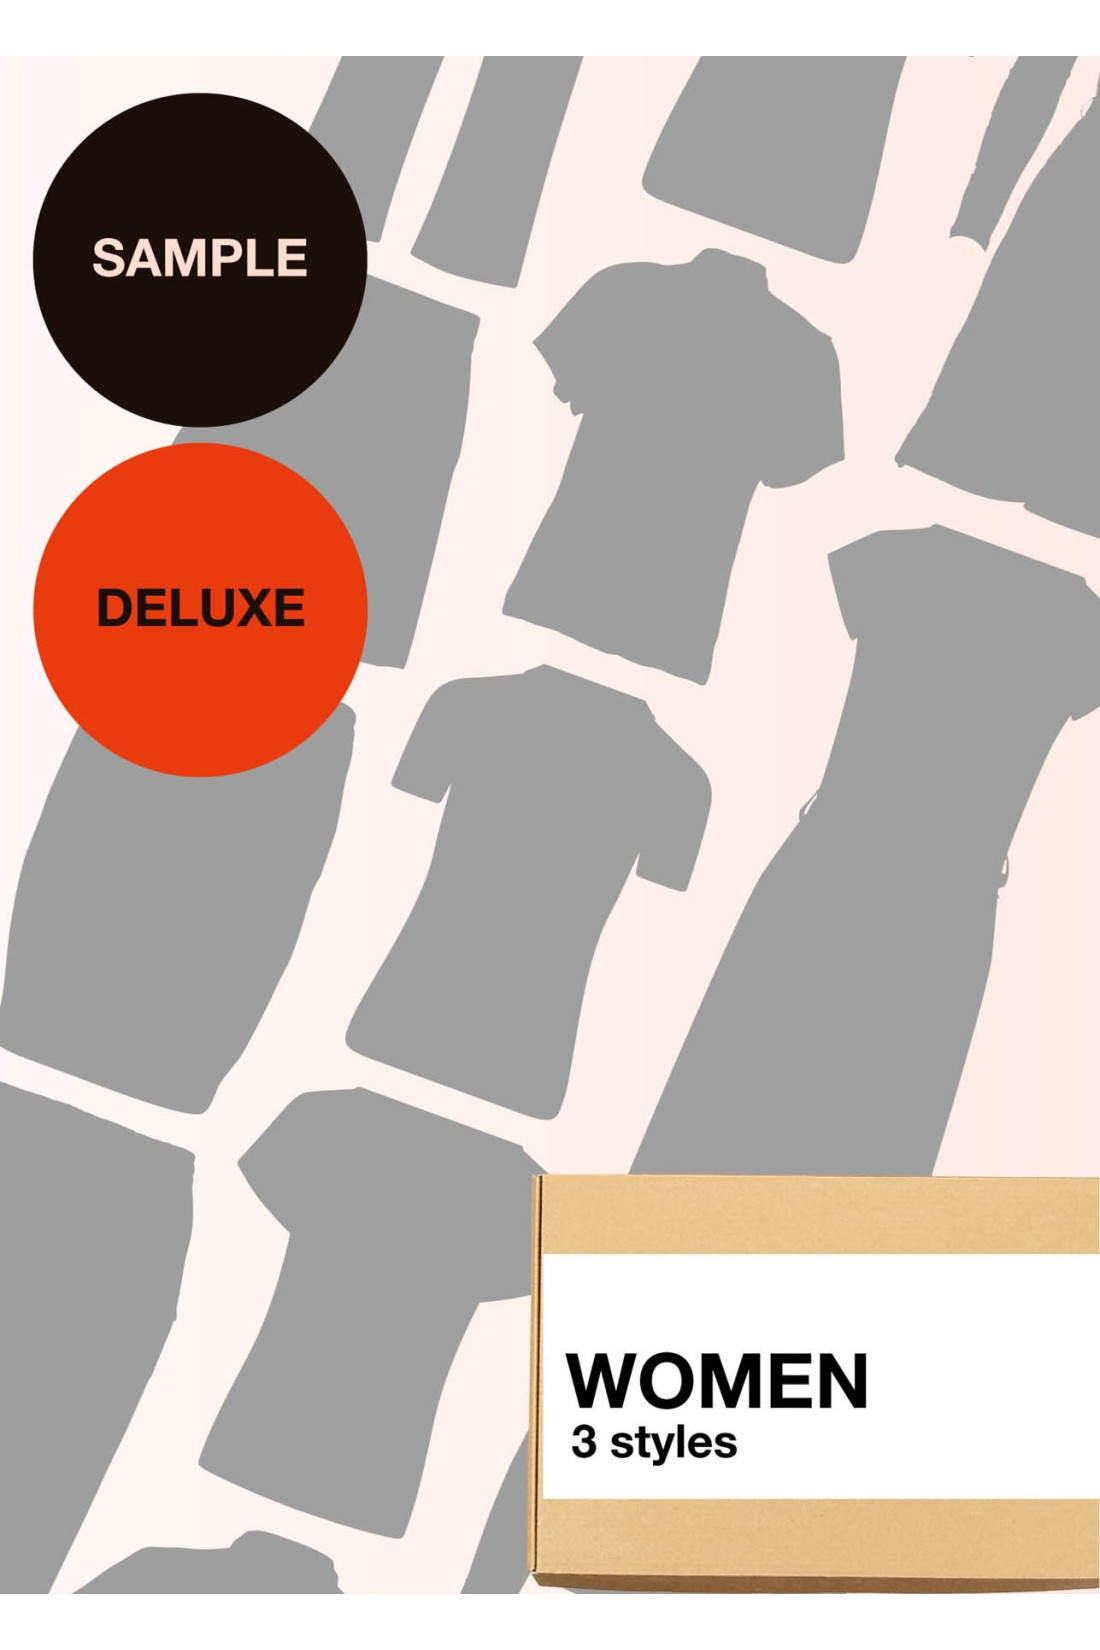 Sample Surprise Box Women Deluxe - 3 Styles